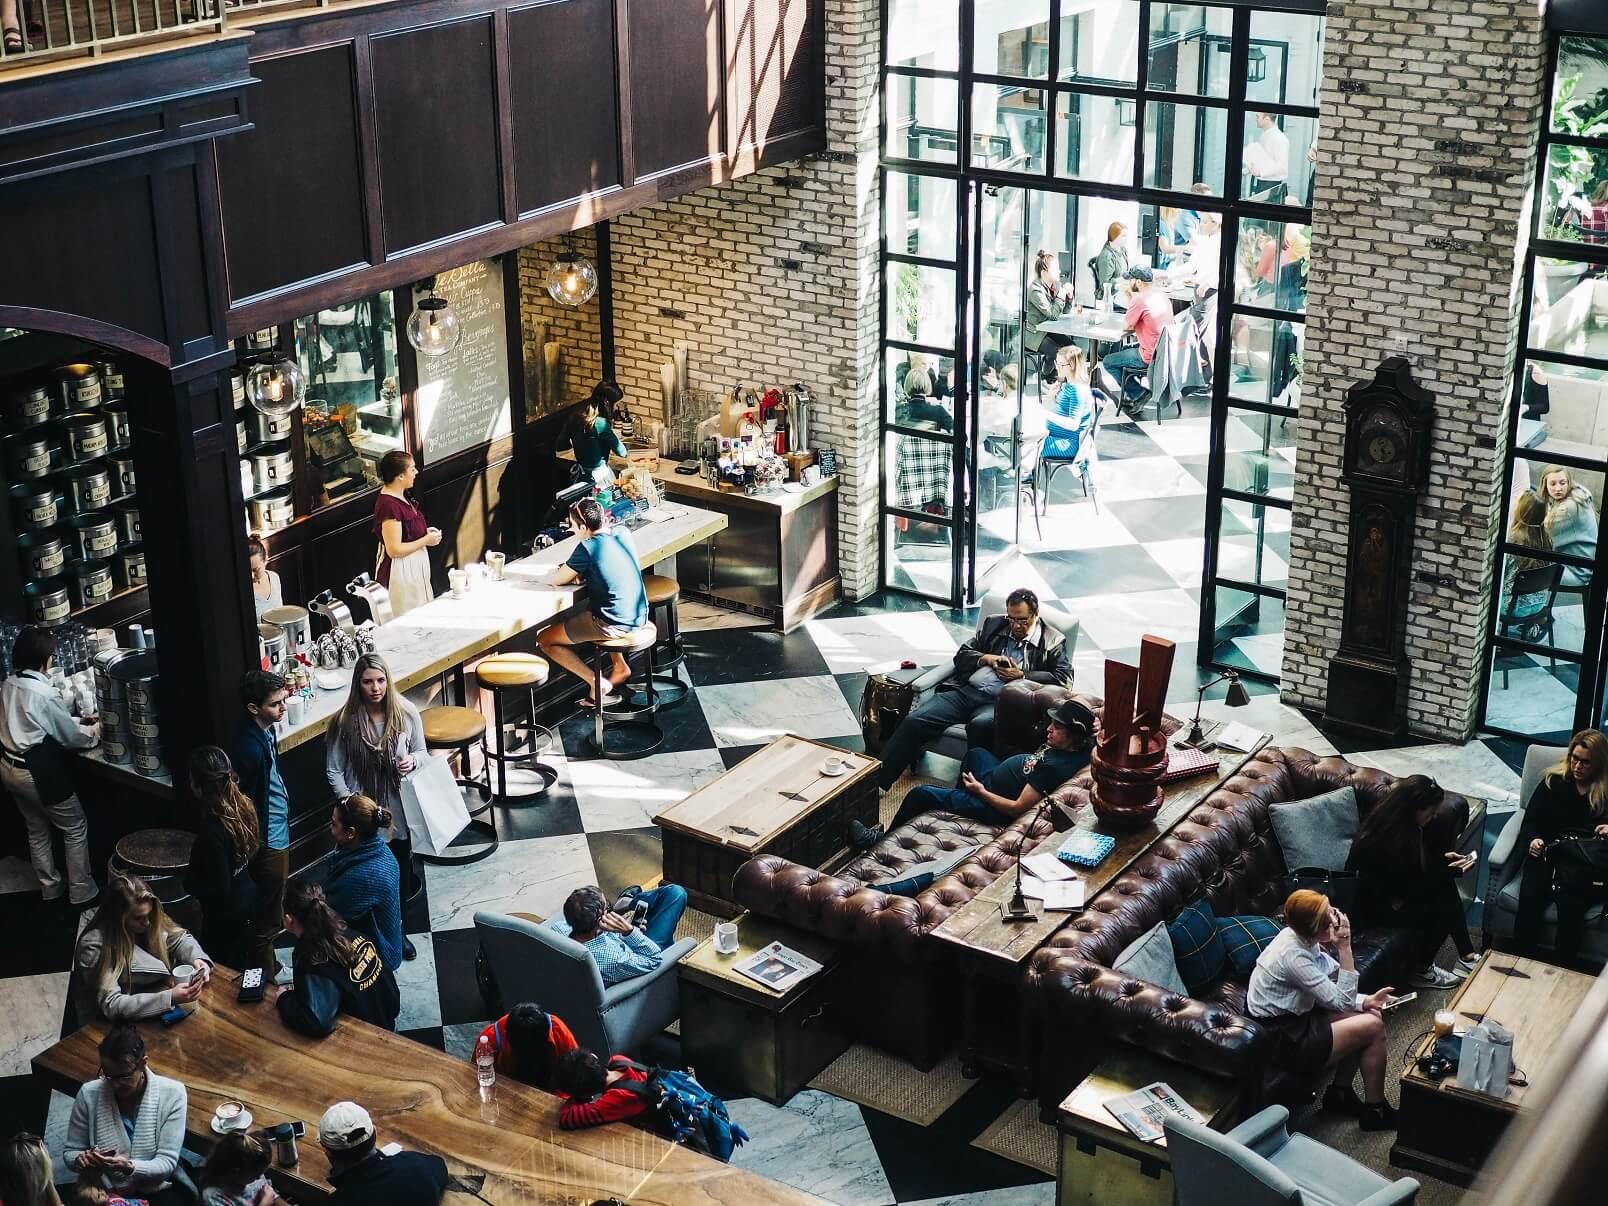 industri retail, strategi industri retail, manajemen industri retail